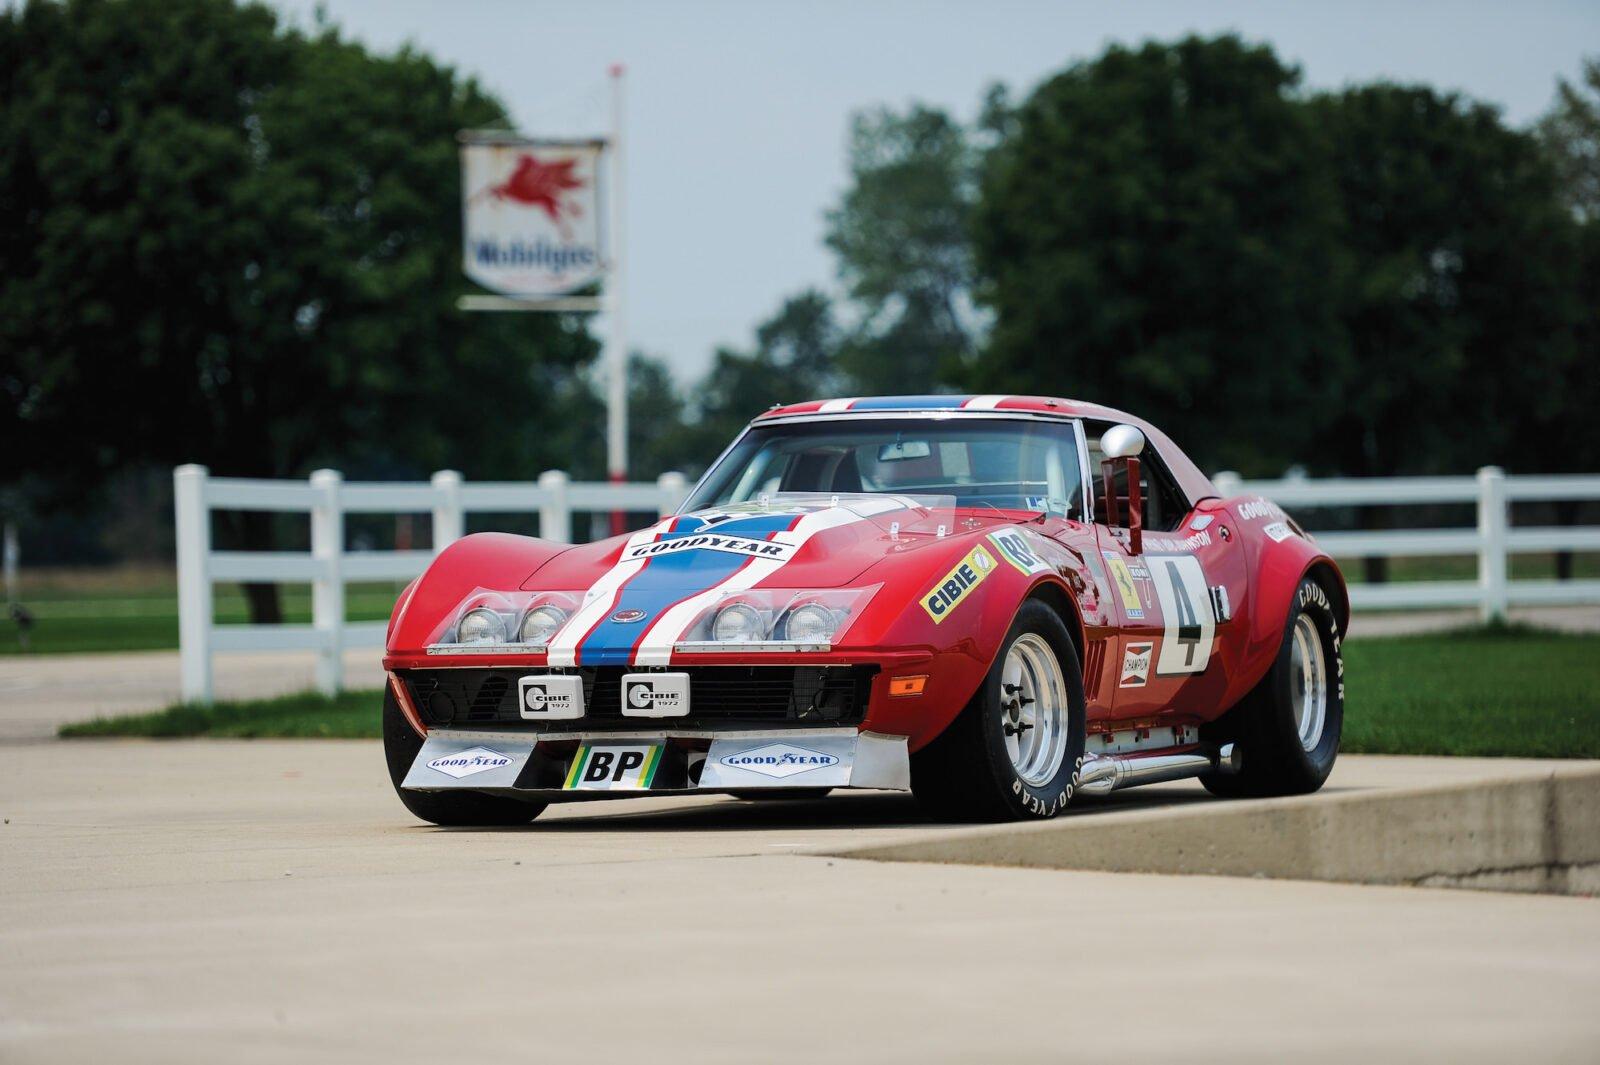 Chevrolet Corvette 1 1600x1065 - Chevrolet Corvette L88 RED/NART Le Mans